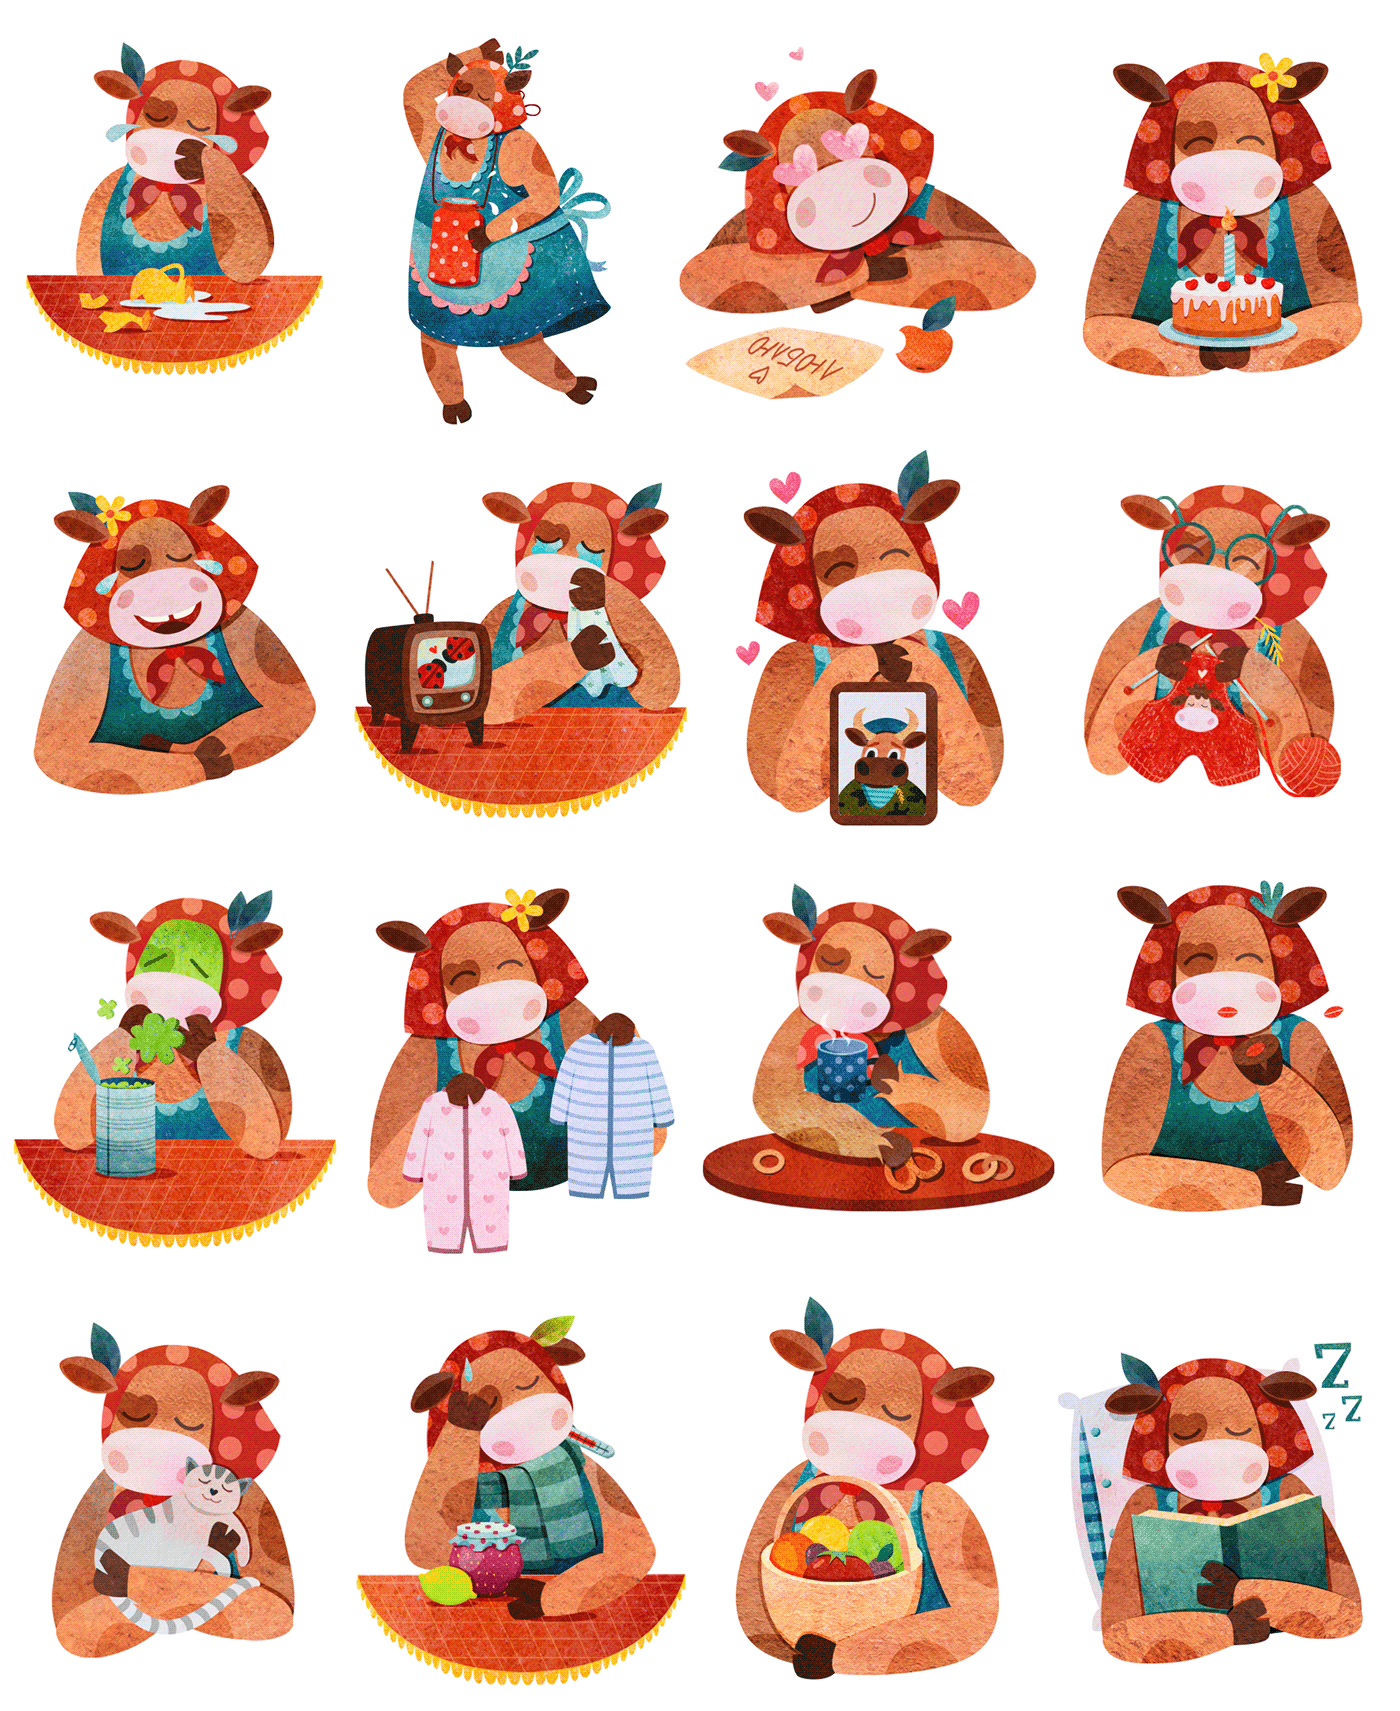 cow ILLUSTRATION  sticker Telegram Character design  watercolor animal farm mood Emoji